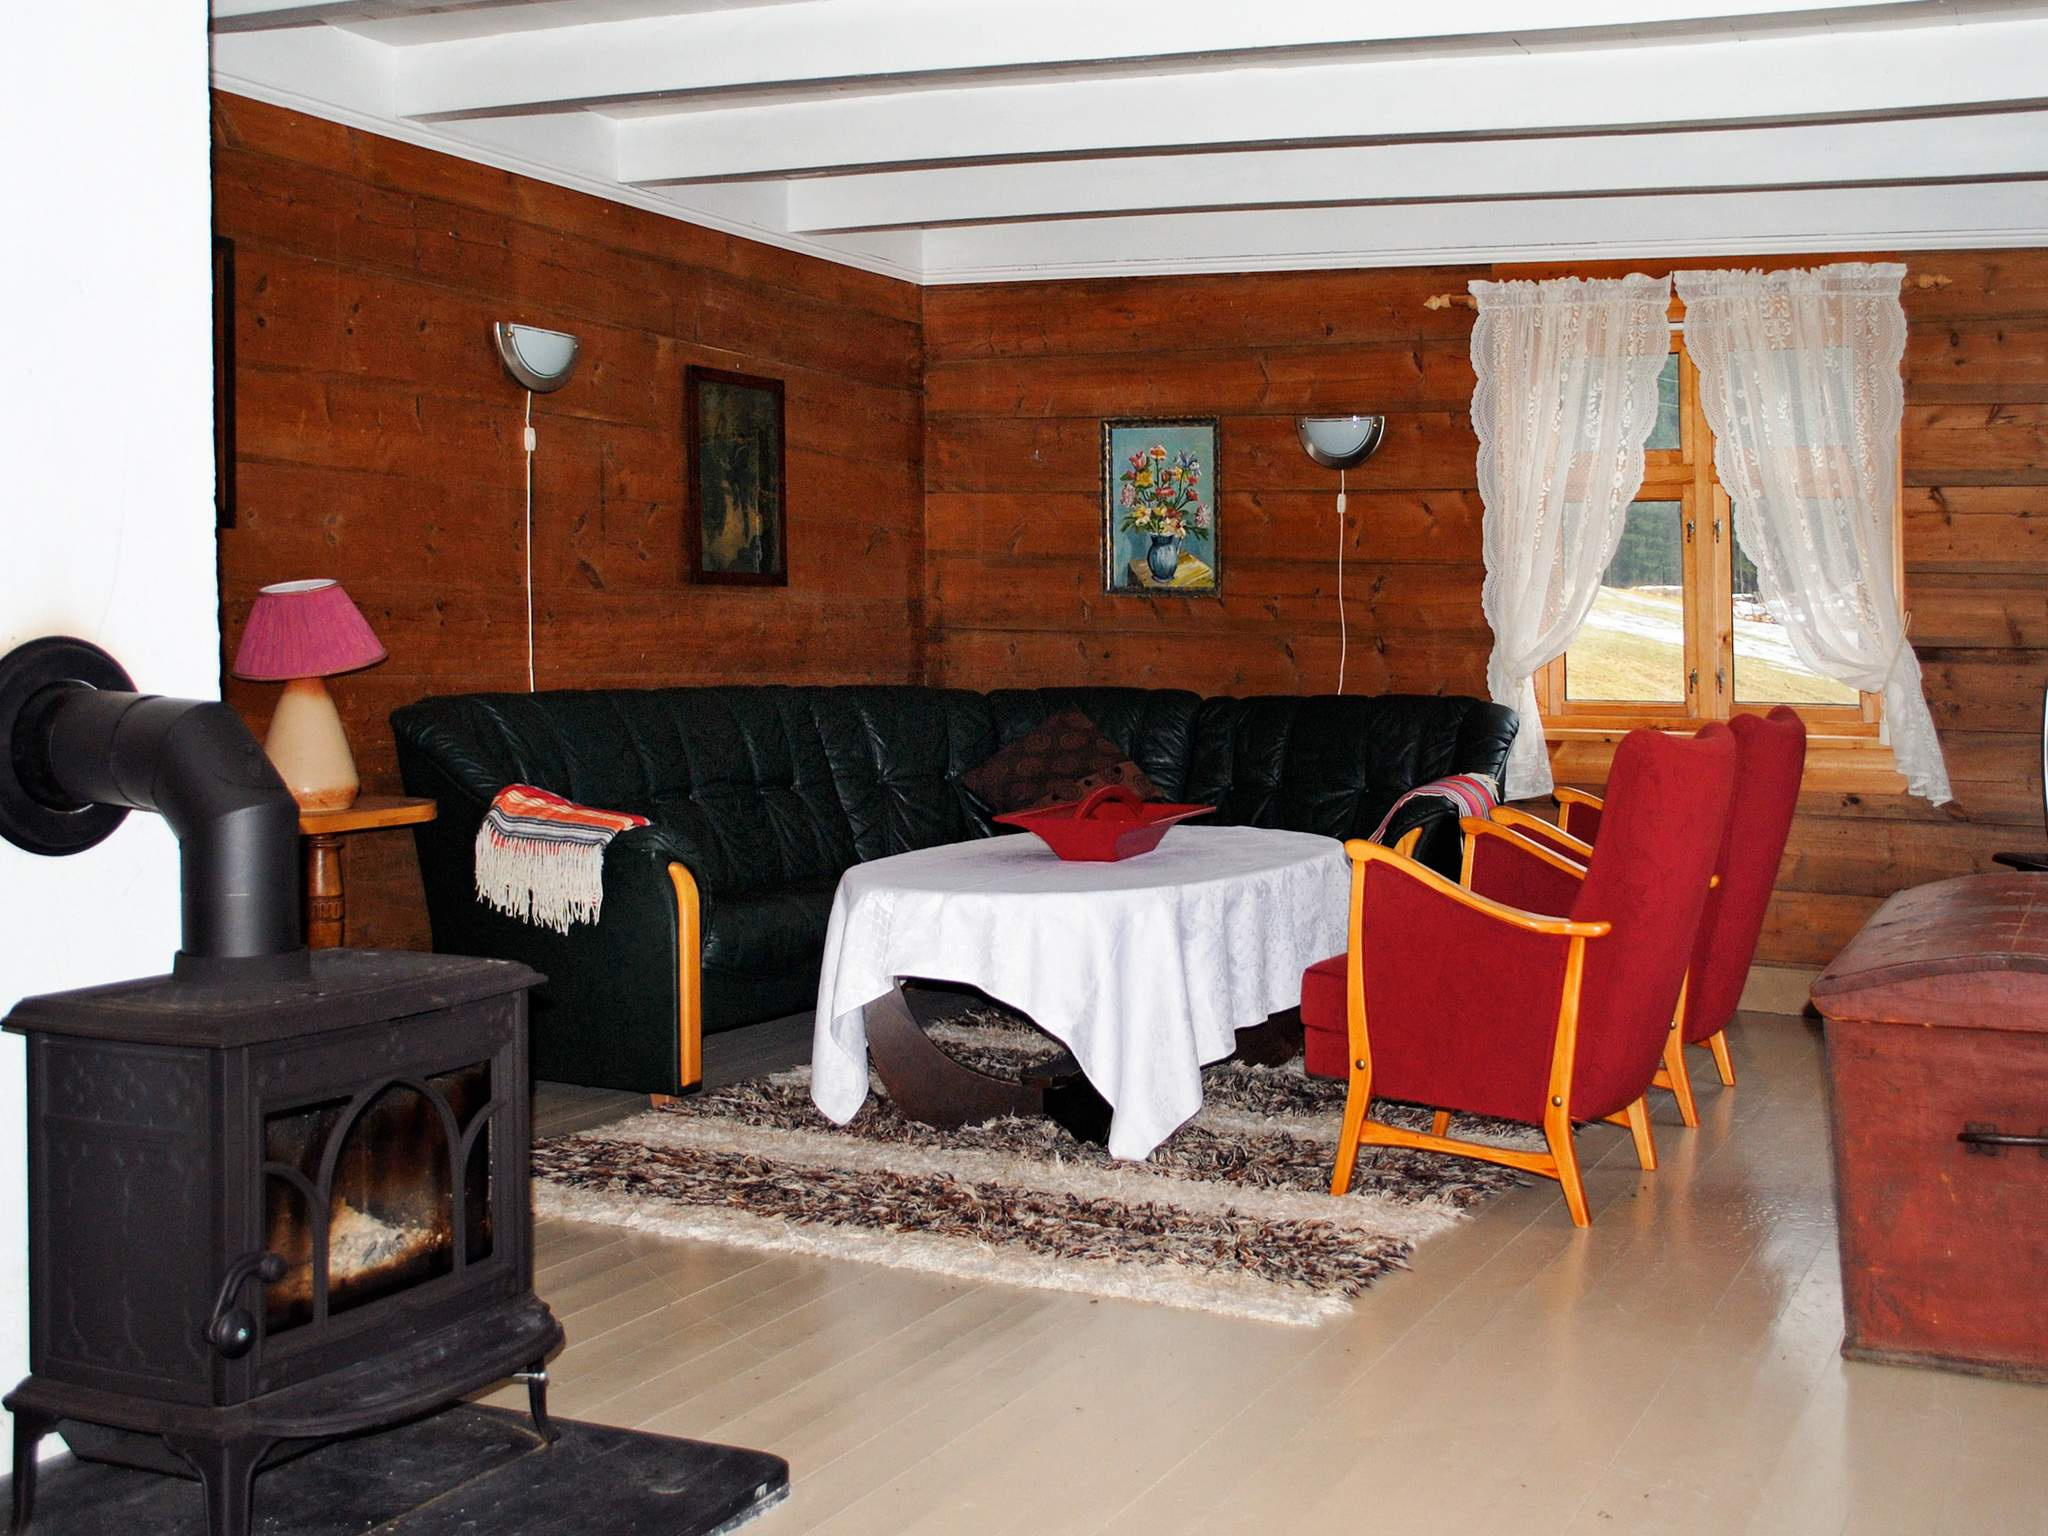 Ferienhaus Etne (83639), Etne, Hordaland - Hardangerfjord, Westnorwegen, Norwegen, Bild 3